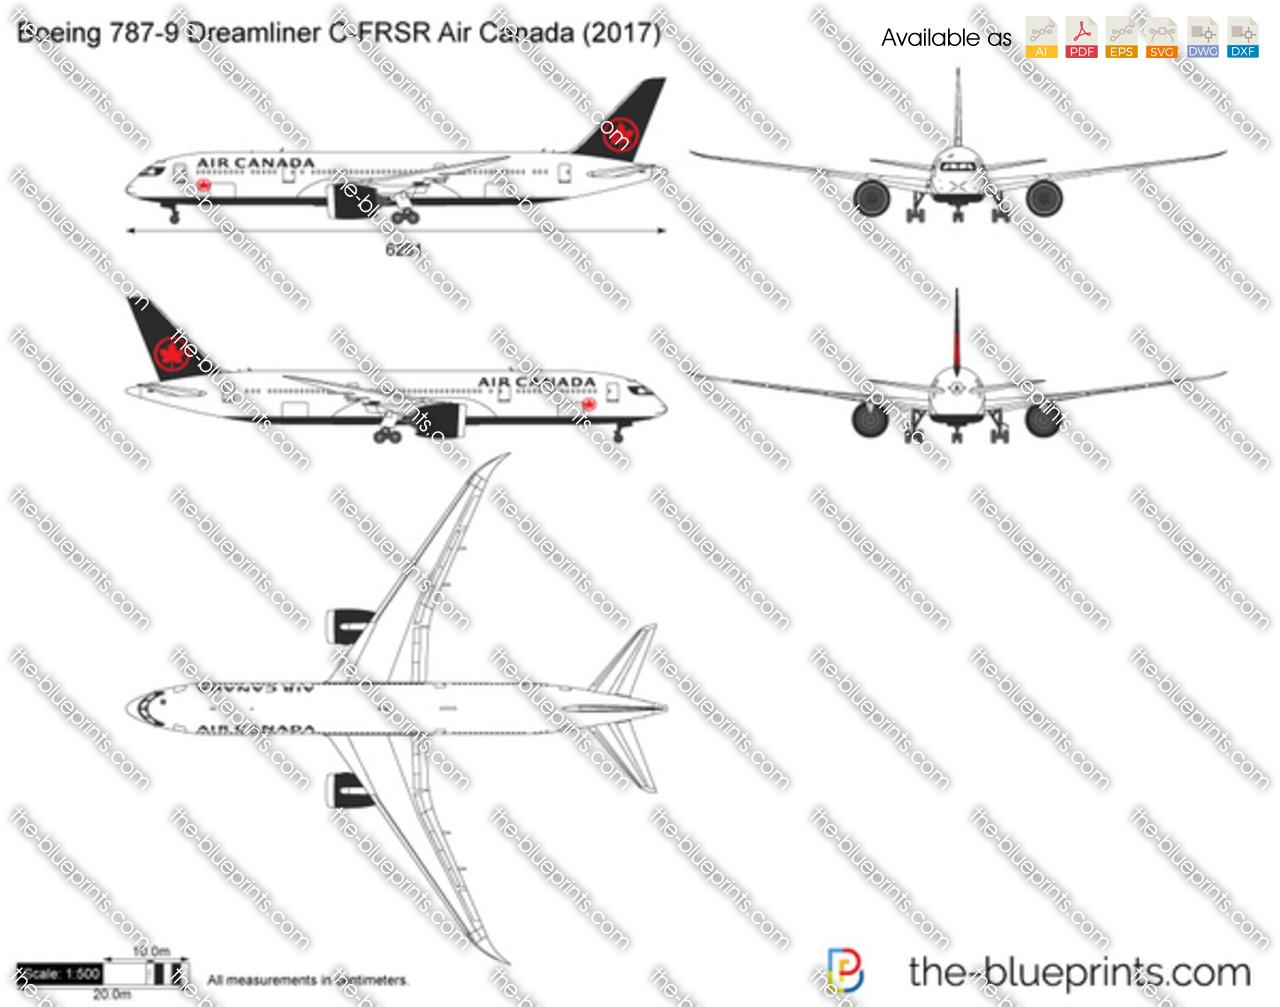 Boeing 787-9 Dreamliner C-FRSR Air Canada